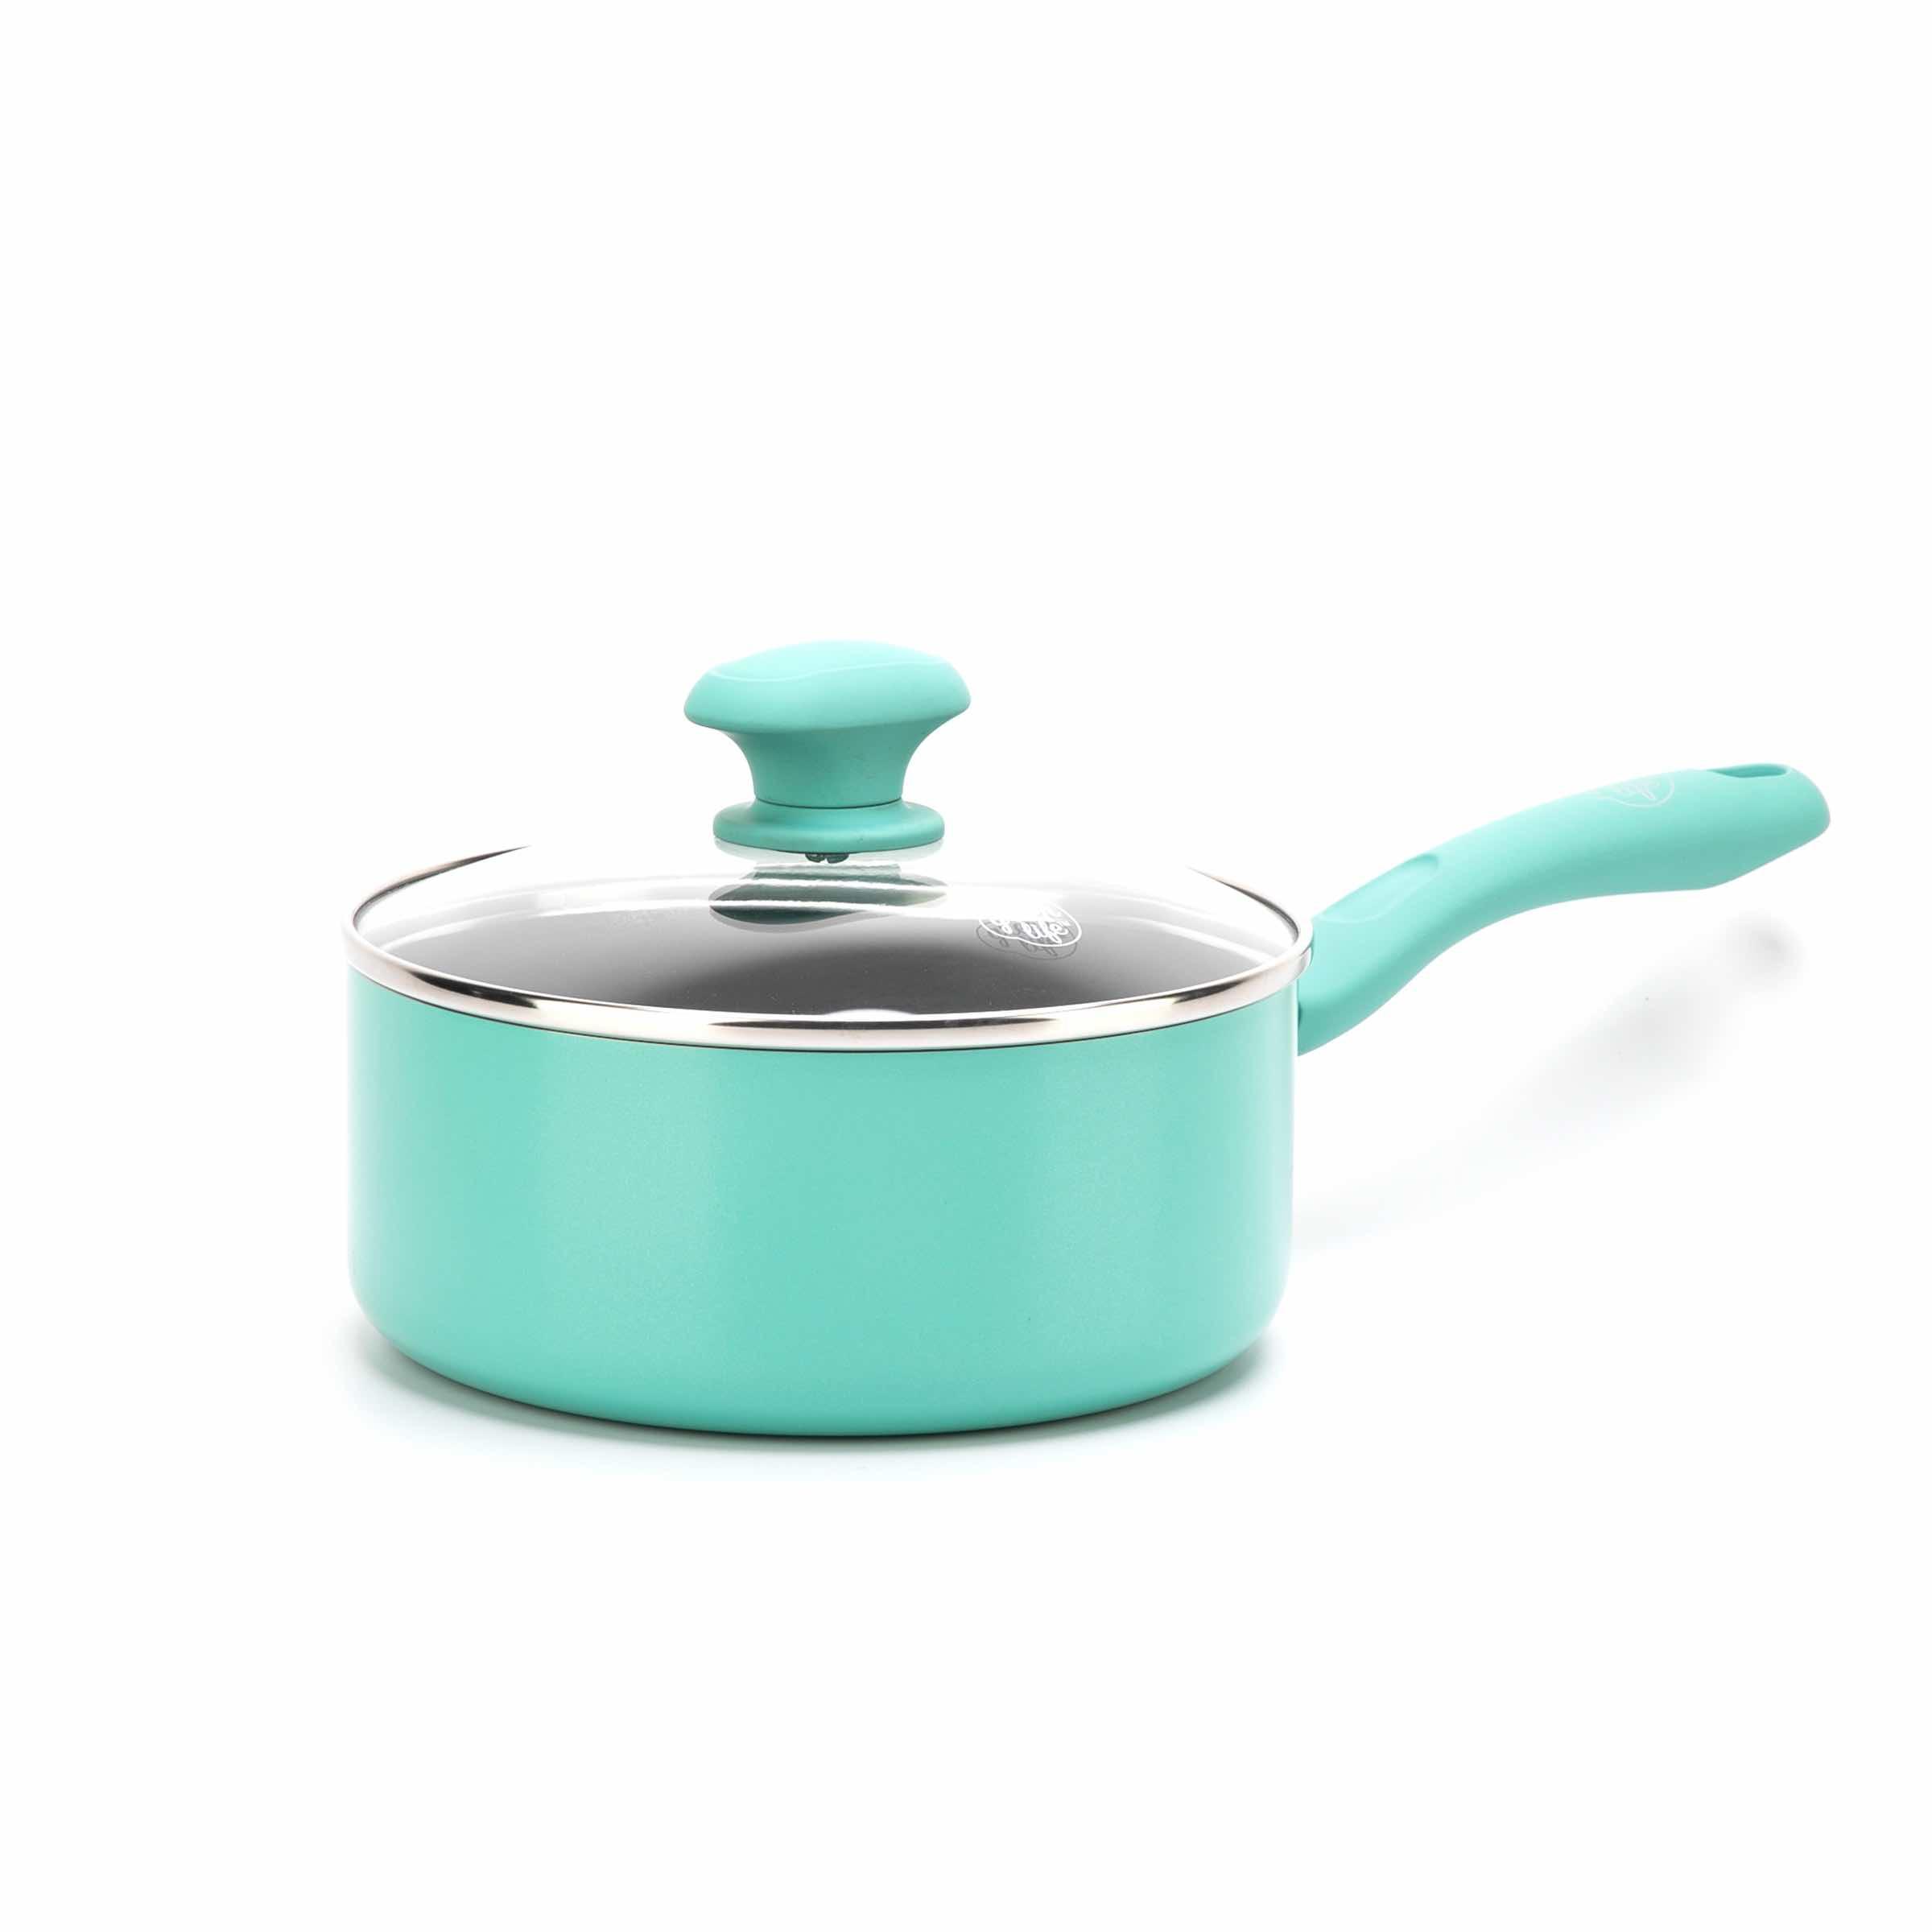 Ceramic Non-stick Sauce Pan